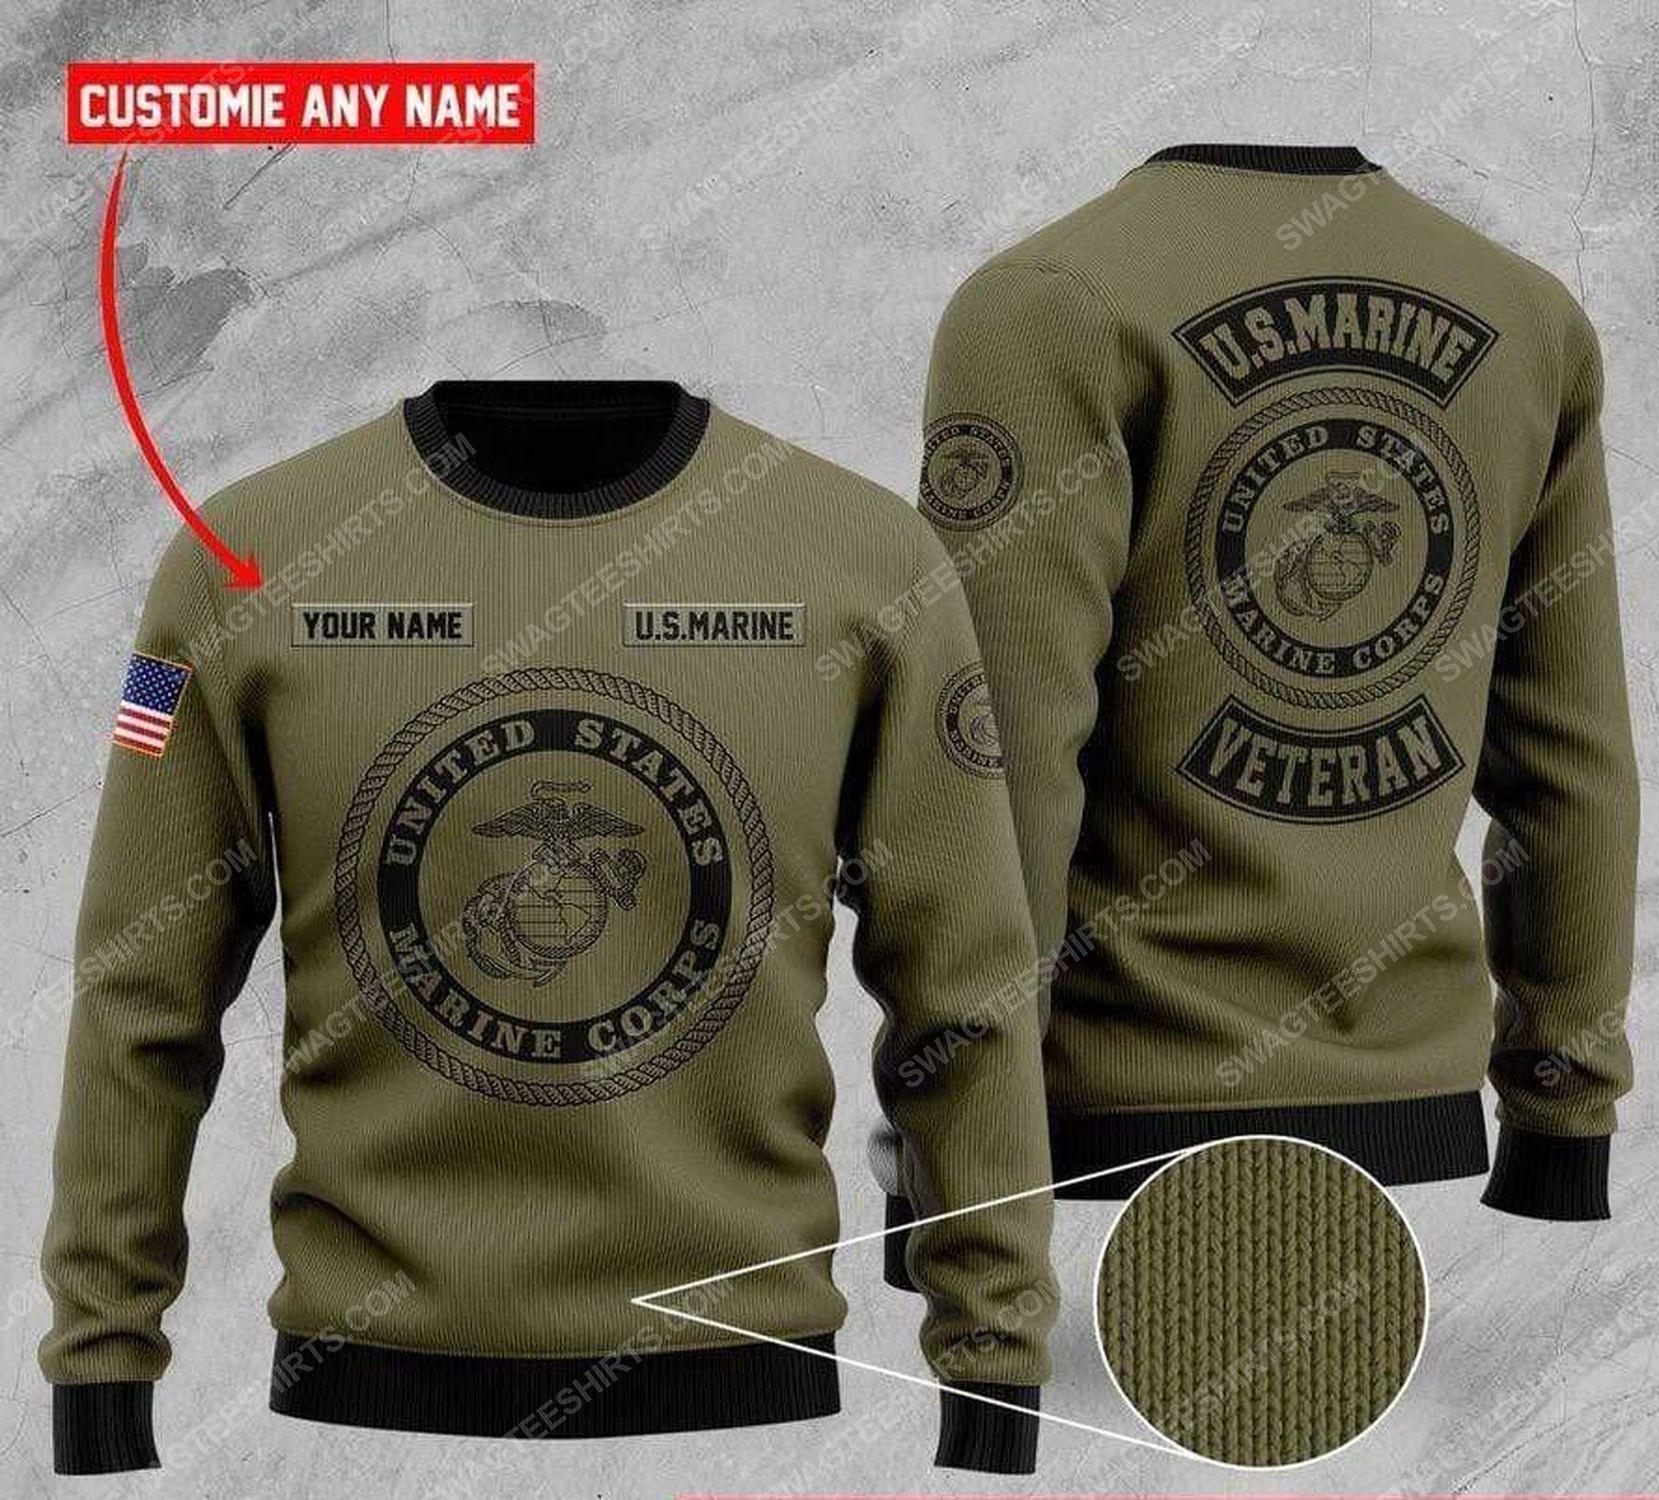 Custom us marine veteran all over print ugly christmas sweater 2 - Copy